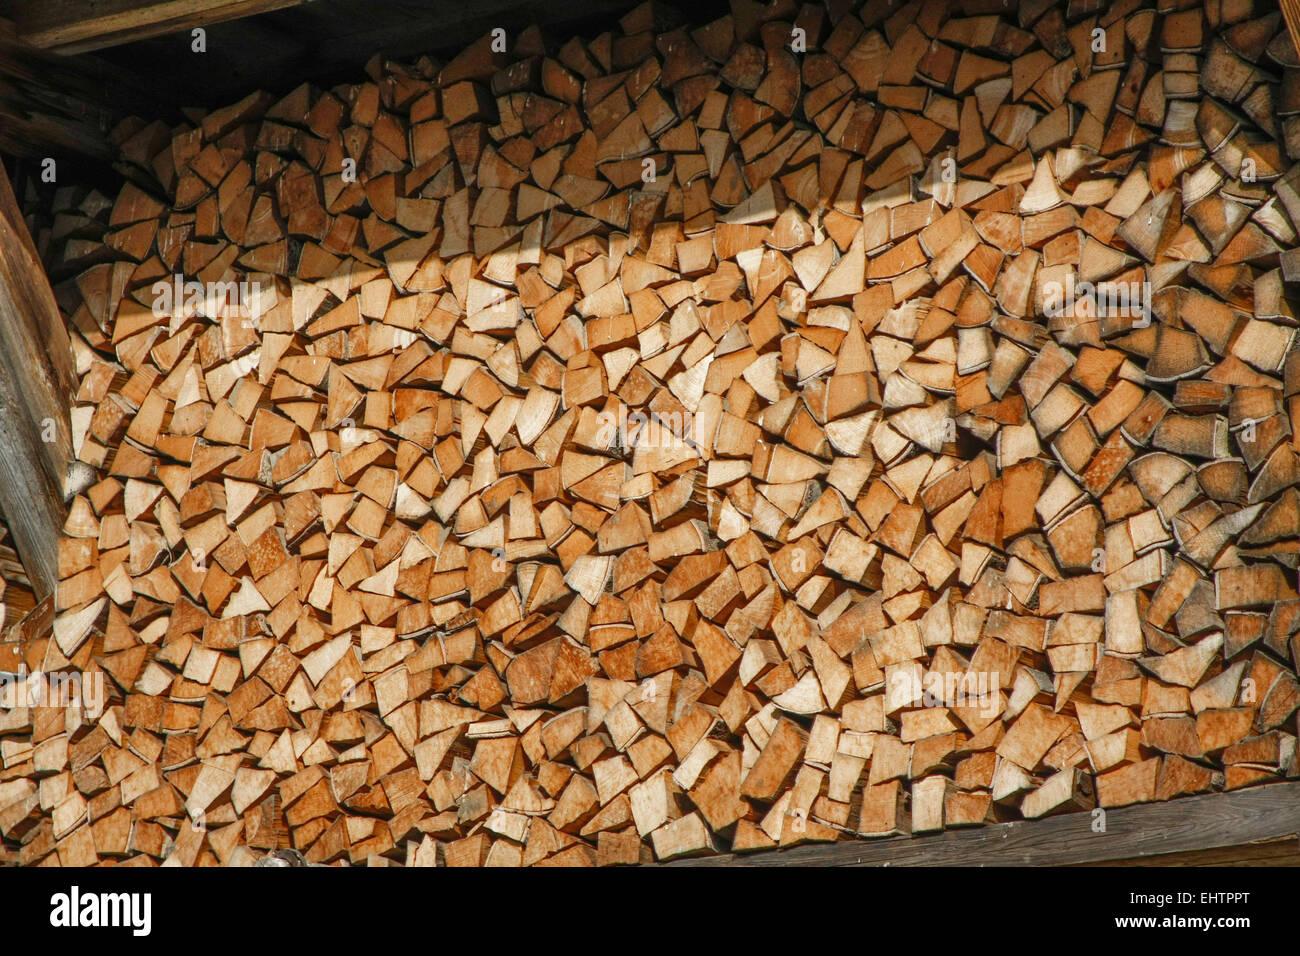 FIREWOOD IN HAUTE-SAVOIE (74), RHONE-ALPES, FRANCE Stock Photo